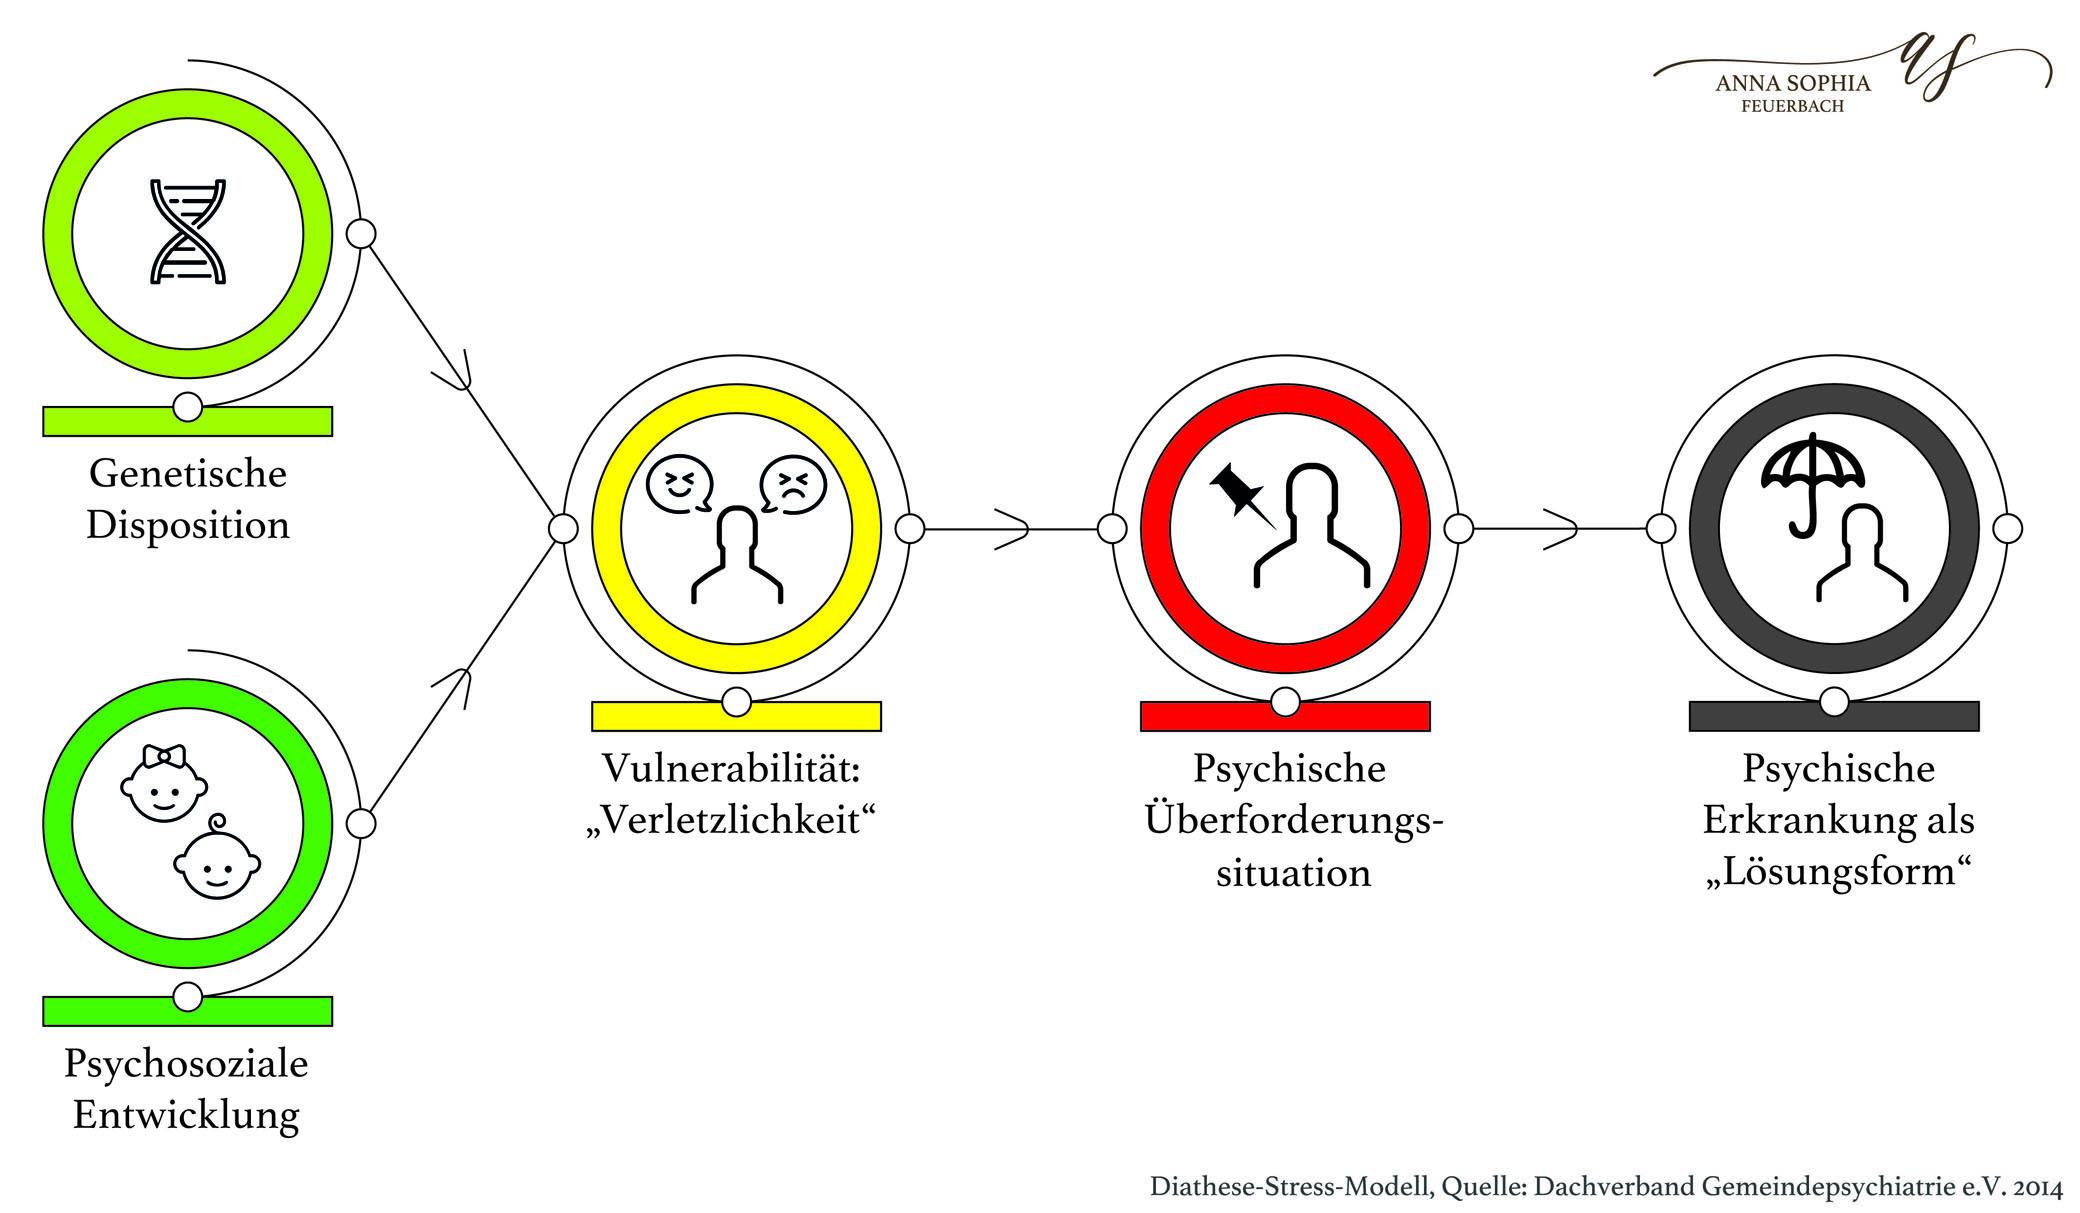 (Quelle: Dachverband Gemeindepsychiatrie e.V. 2014)